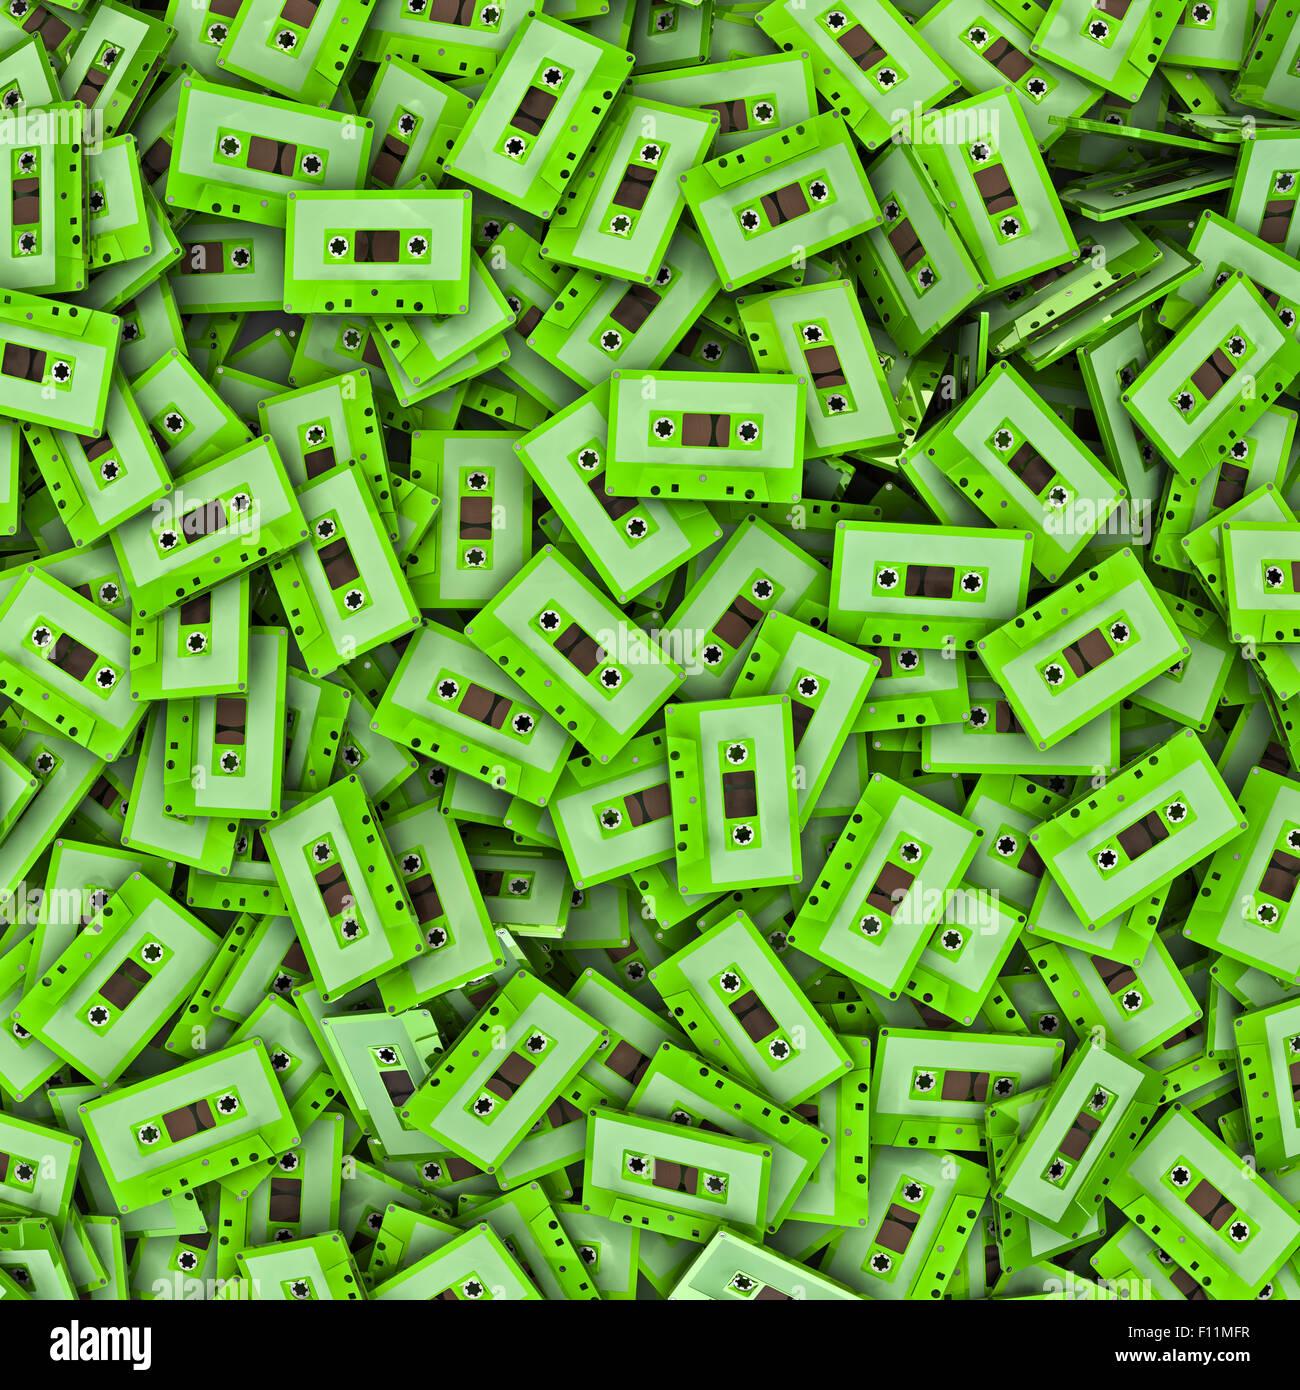 Cassette background, 3D render of cassette tapes - Stock Image